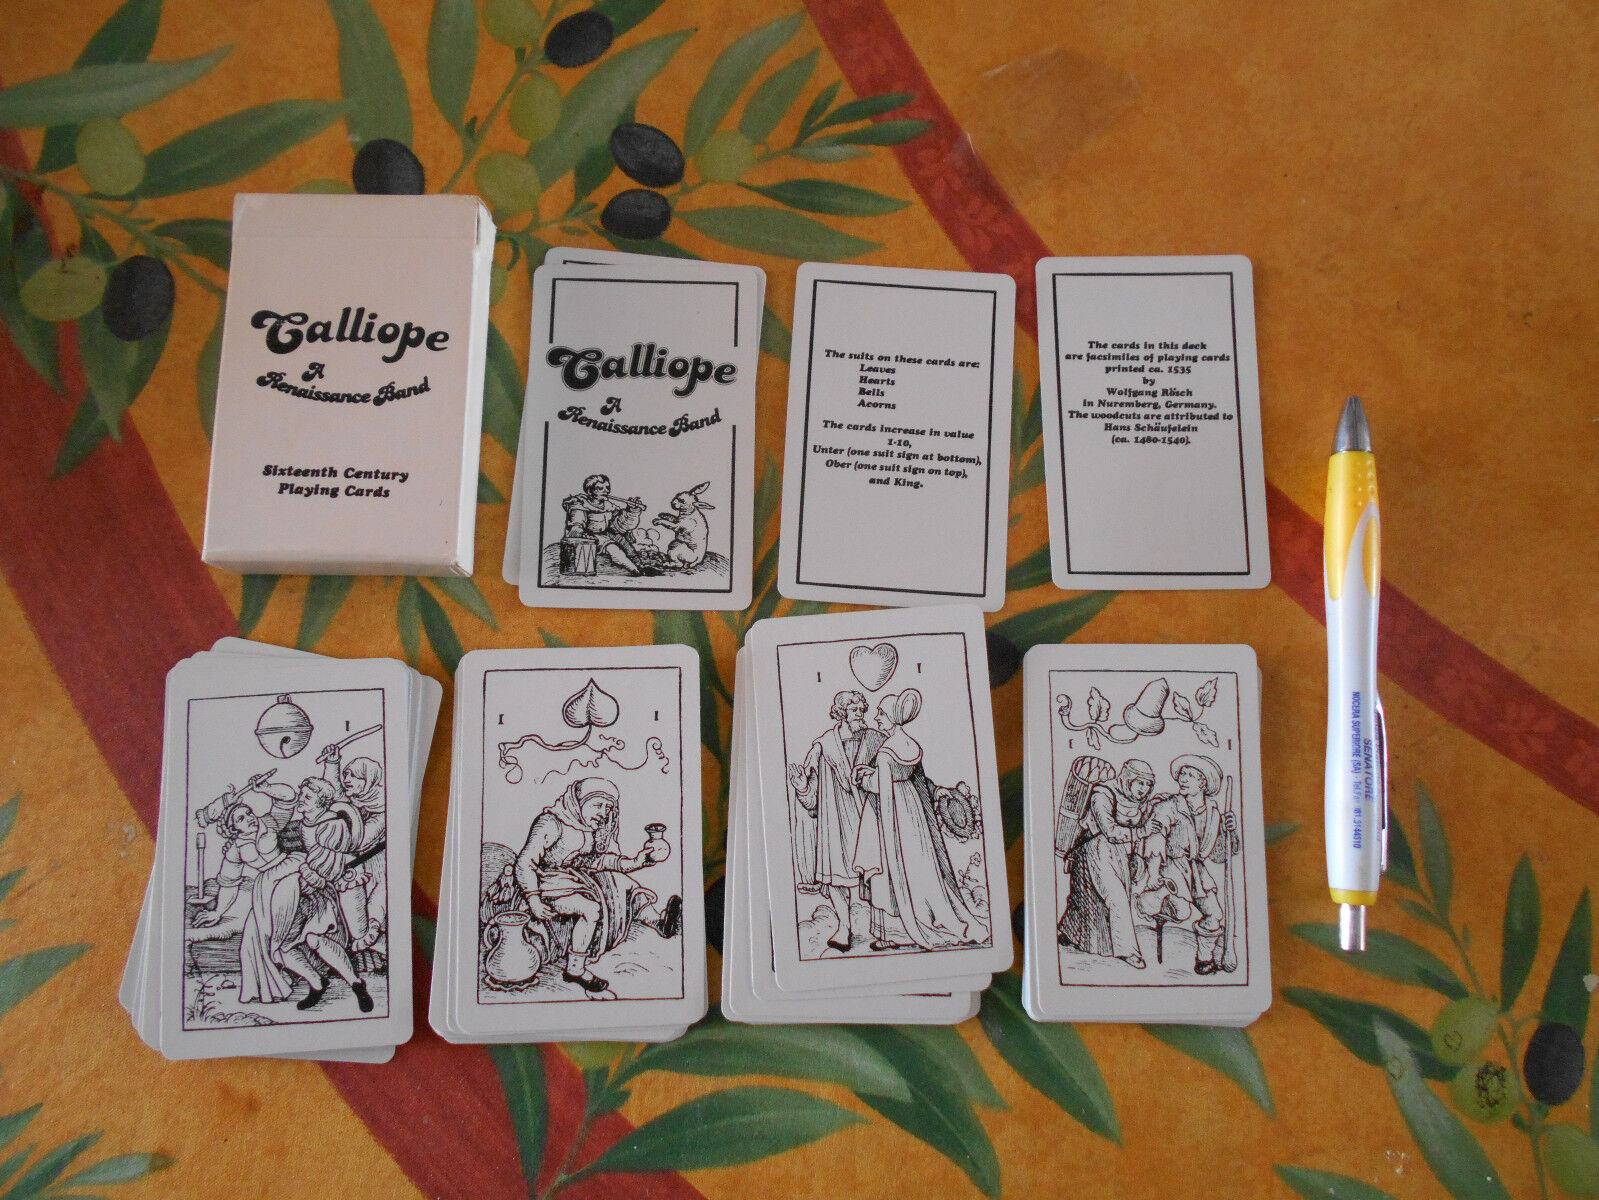 Calliope a renaissance band Sixteenth century playing cards carte poker rarità